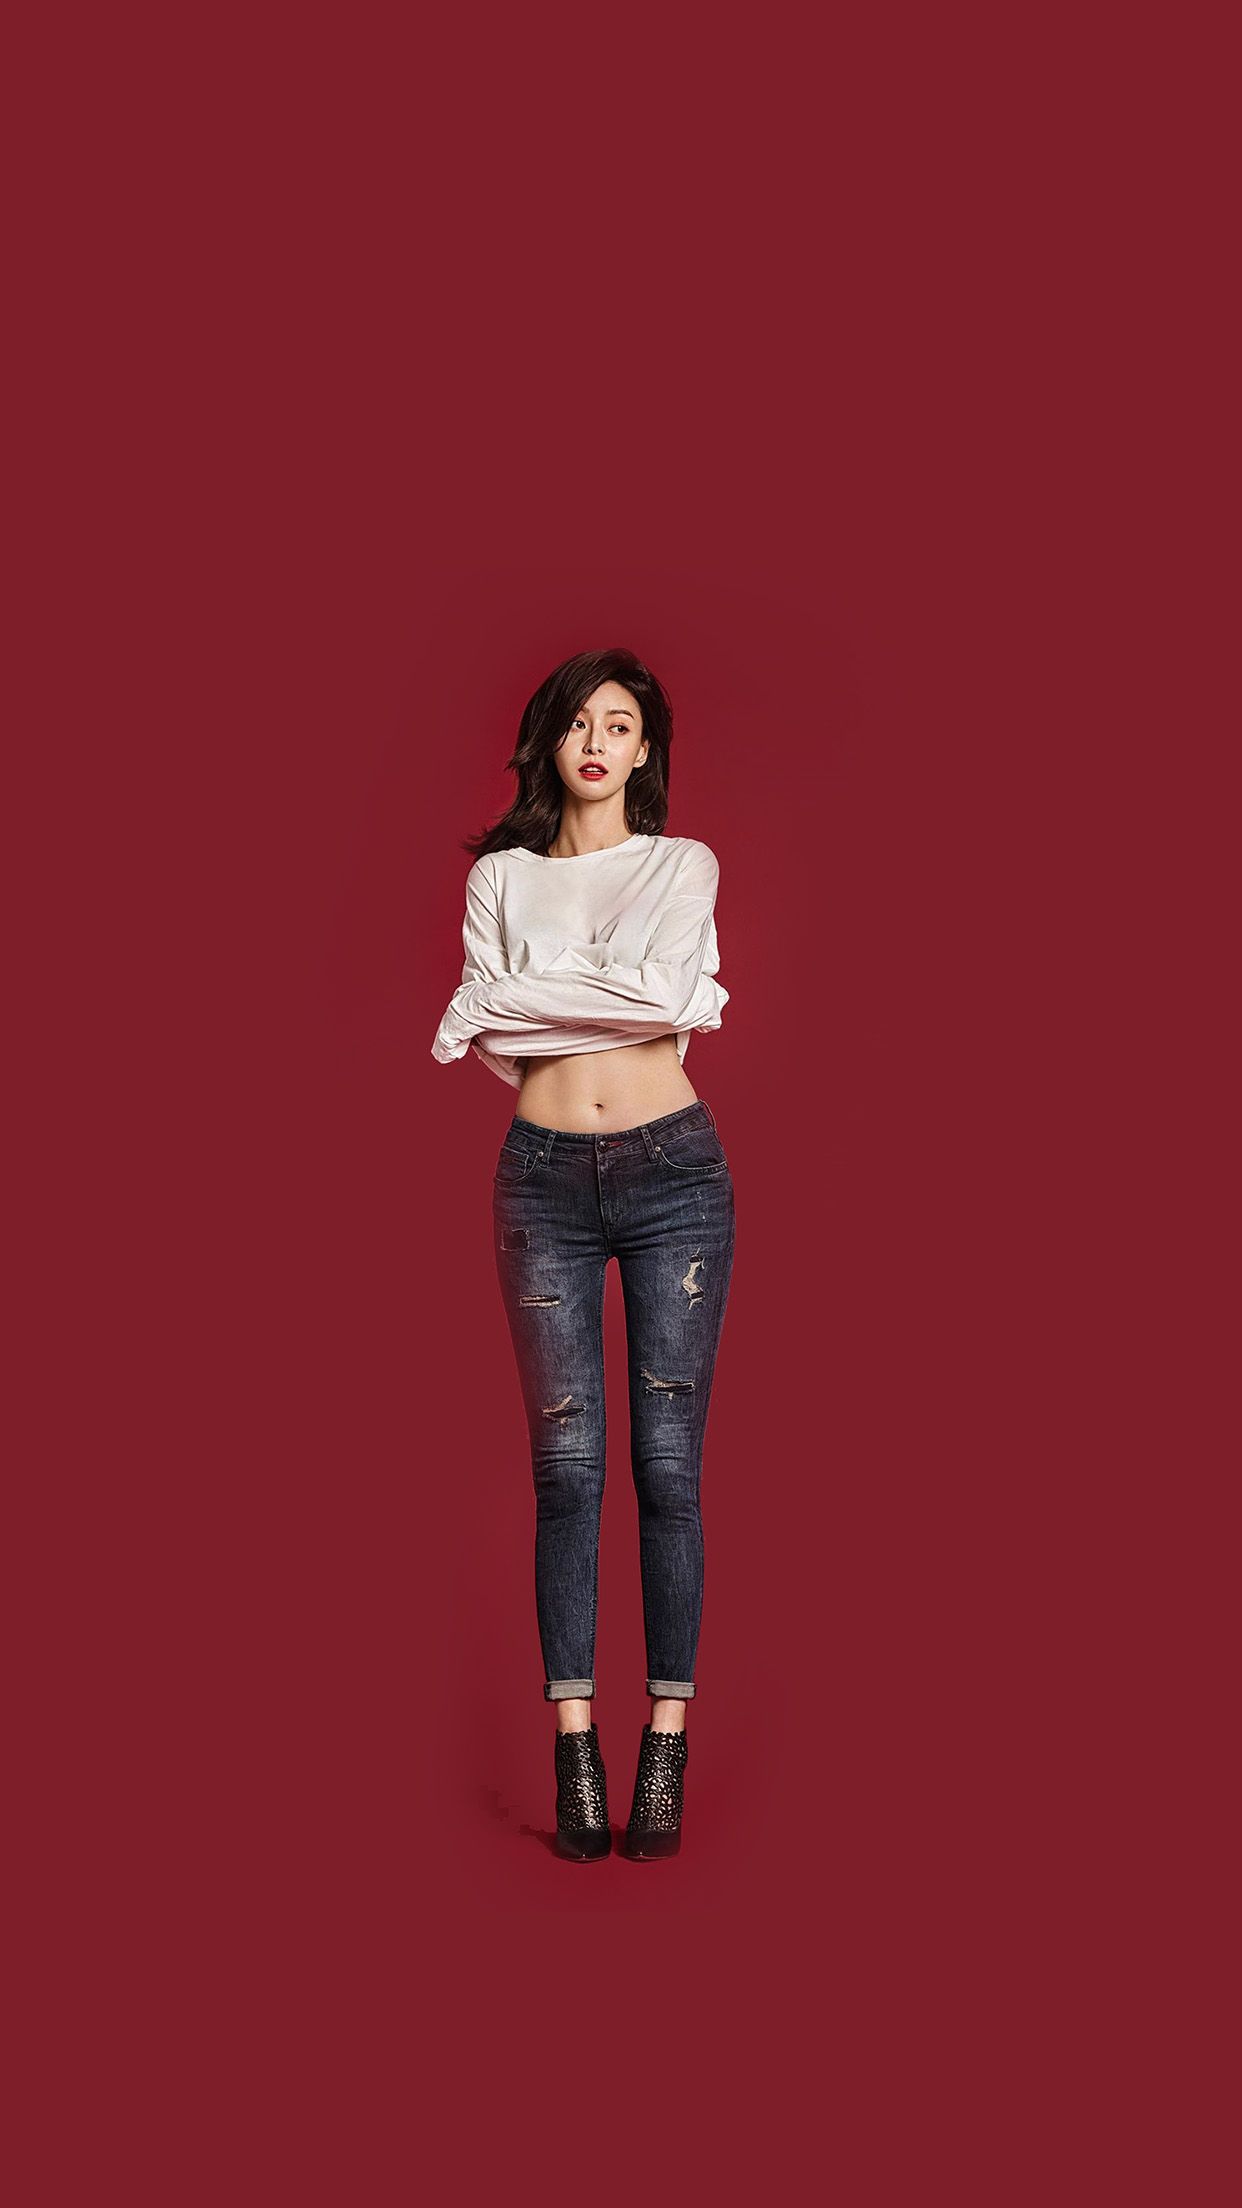 iphone7papers | iphone7 wallpaper | hk02-kpop-girl-kwon-nara-red